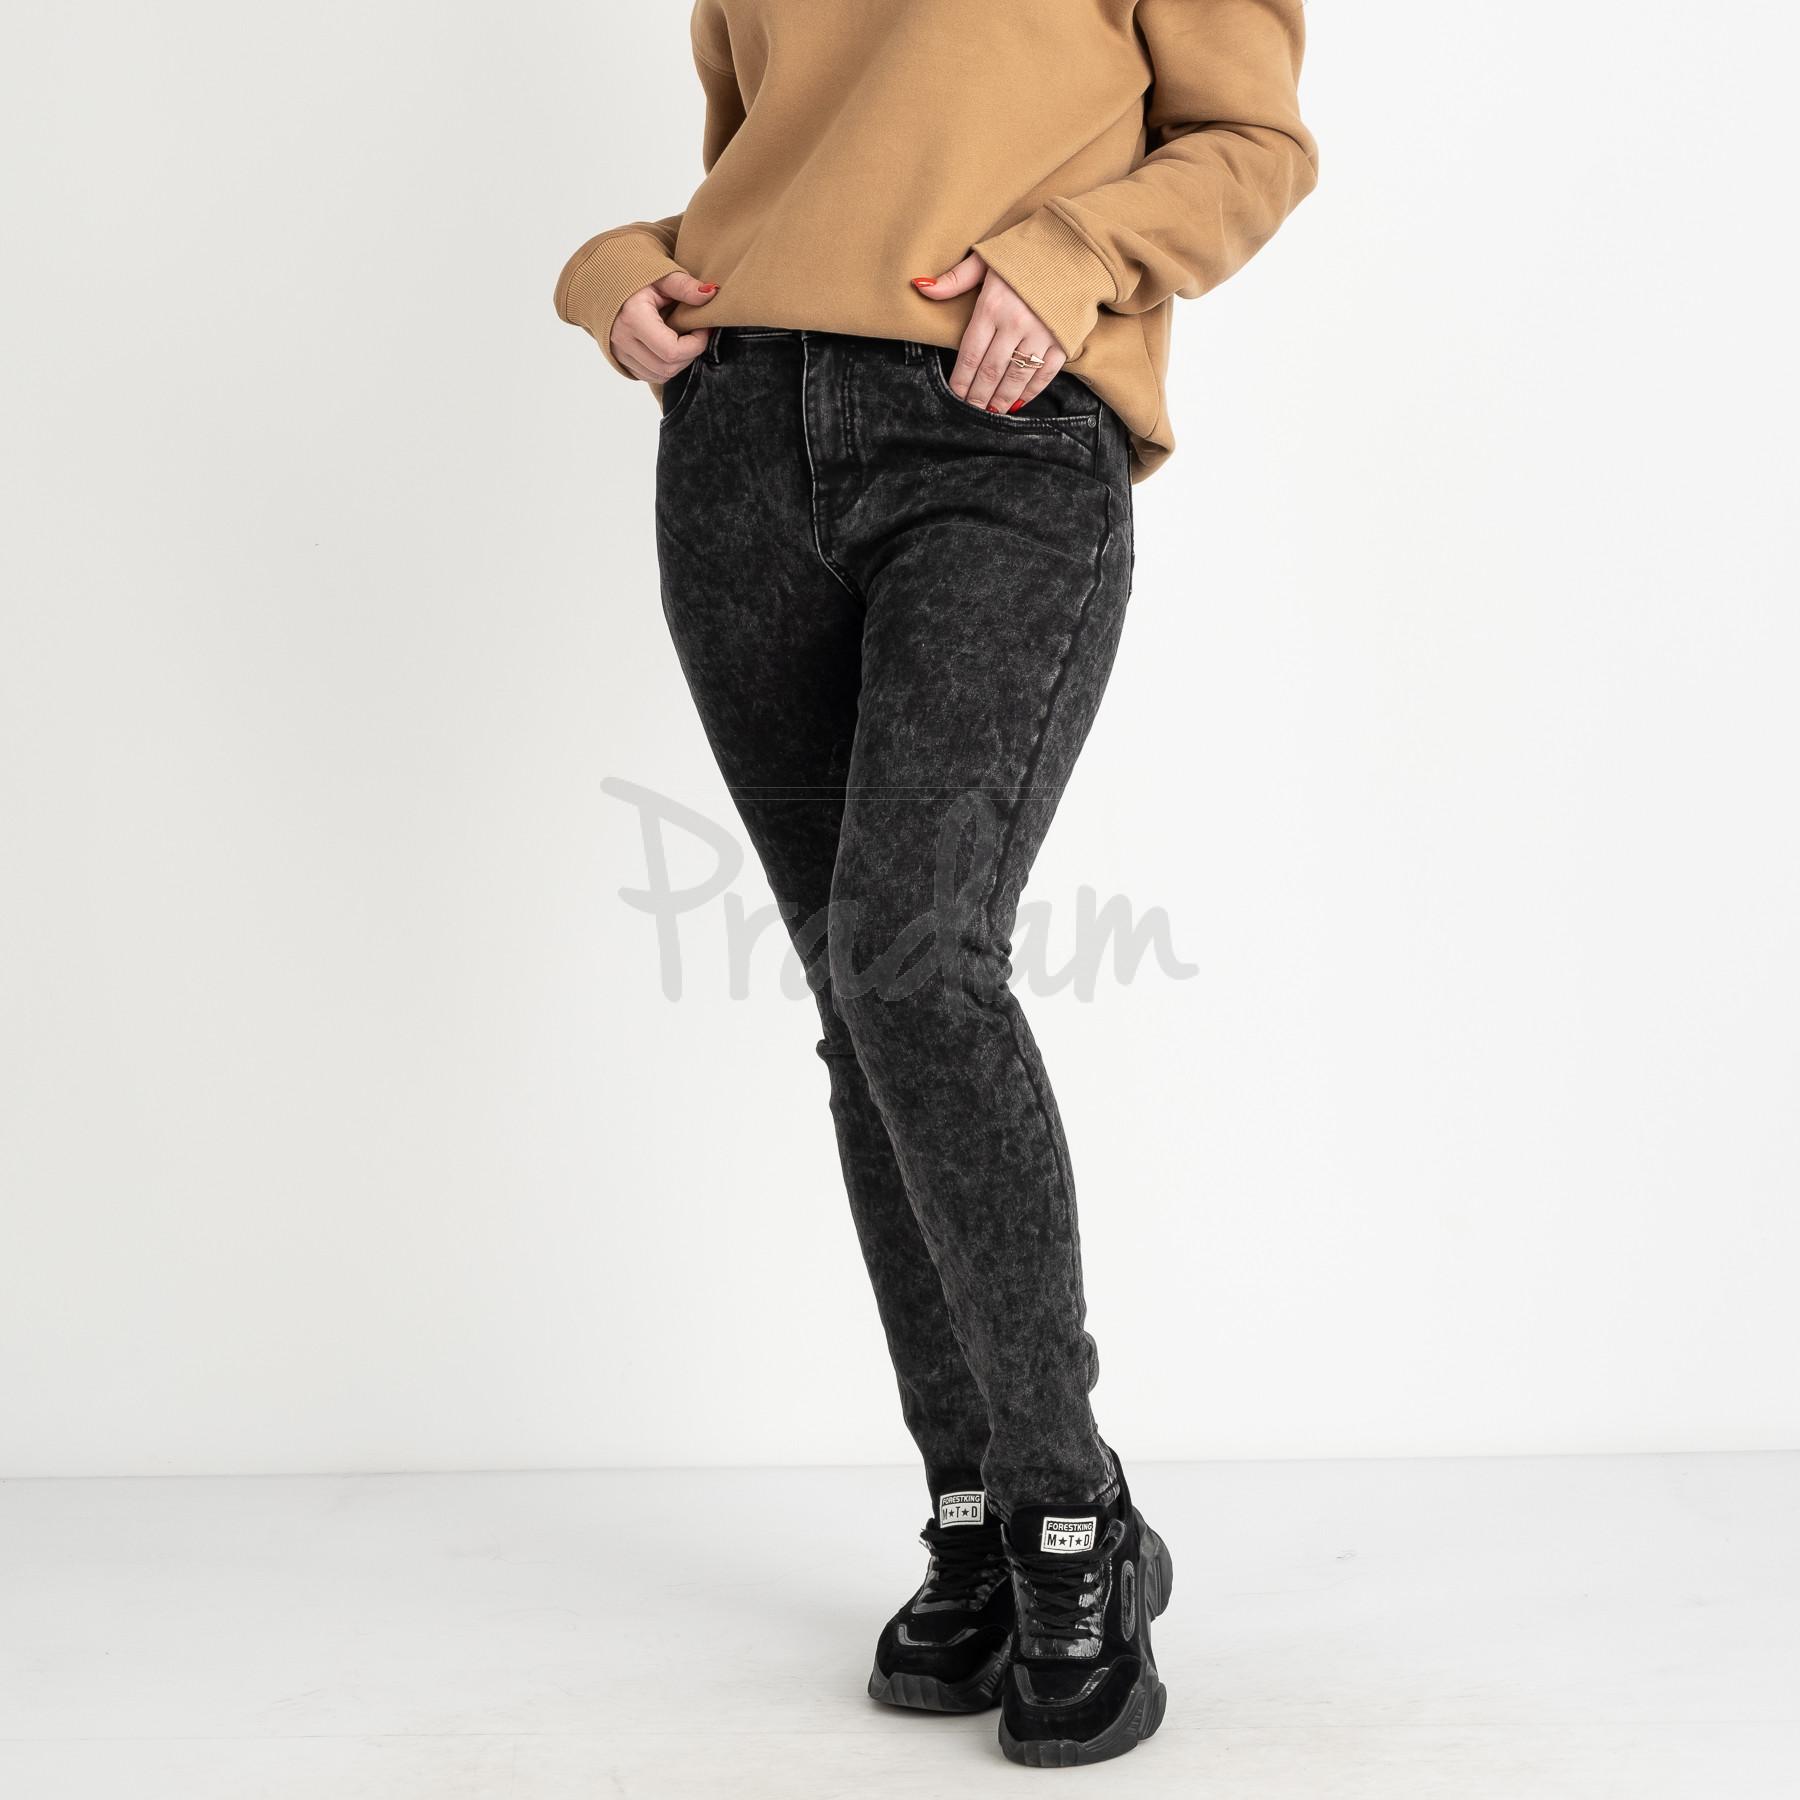 6026 New Jeans американка на флисе полубатальная серая стрейчевая (6 ед.размеры: 28.29.30.31.32.33)